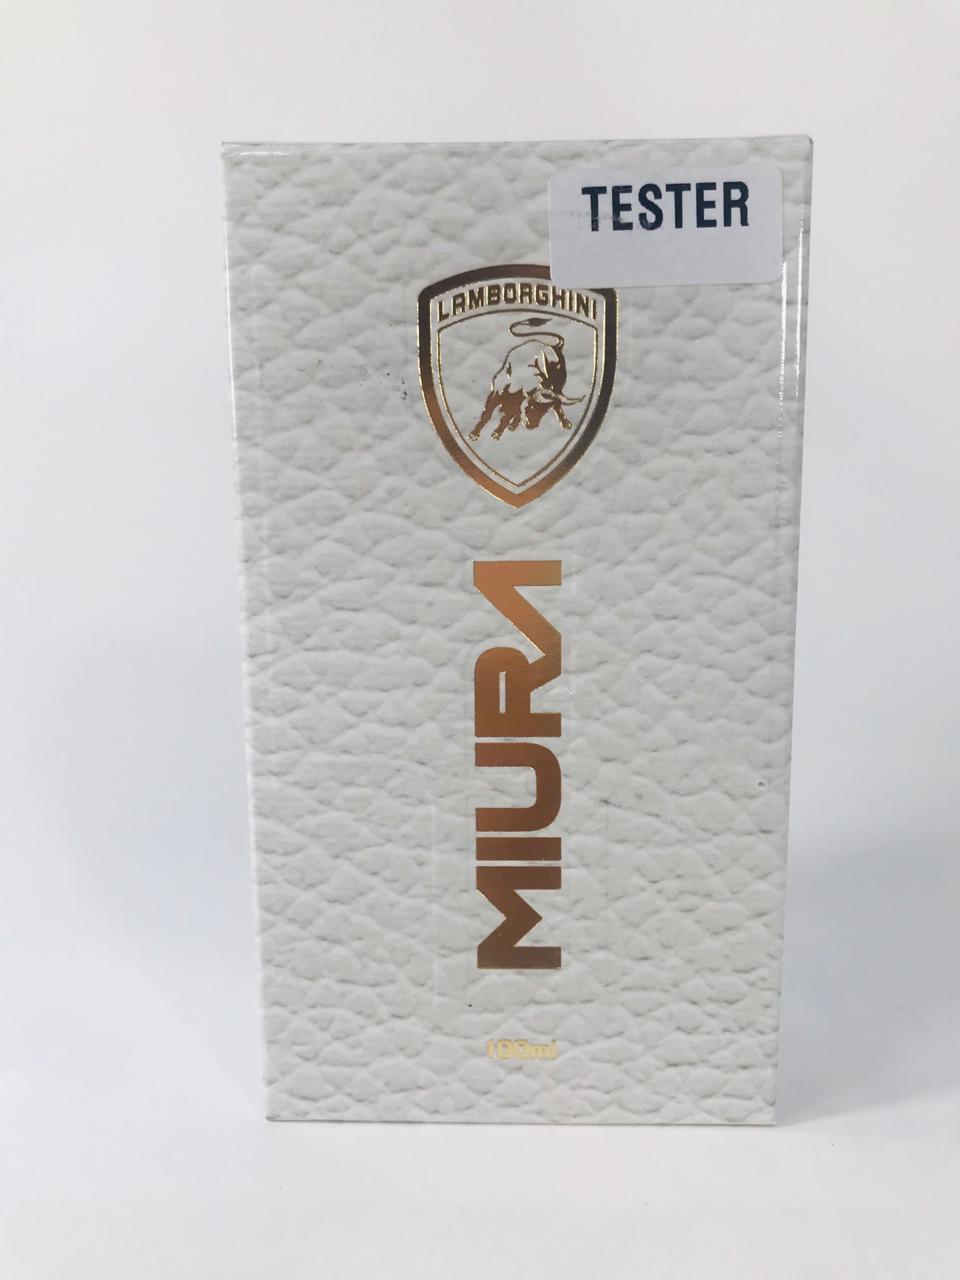 Lamborguini Miura Dêo Colônia 100 ml - Tester